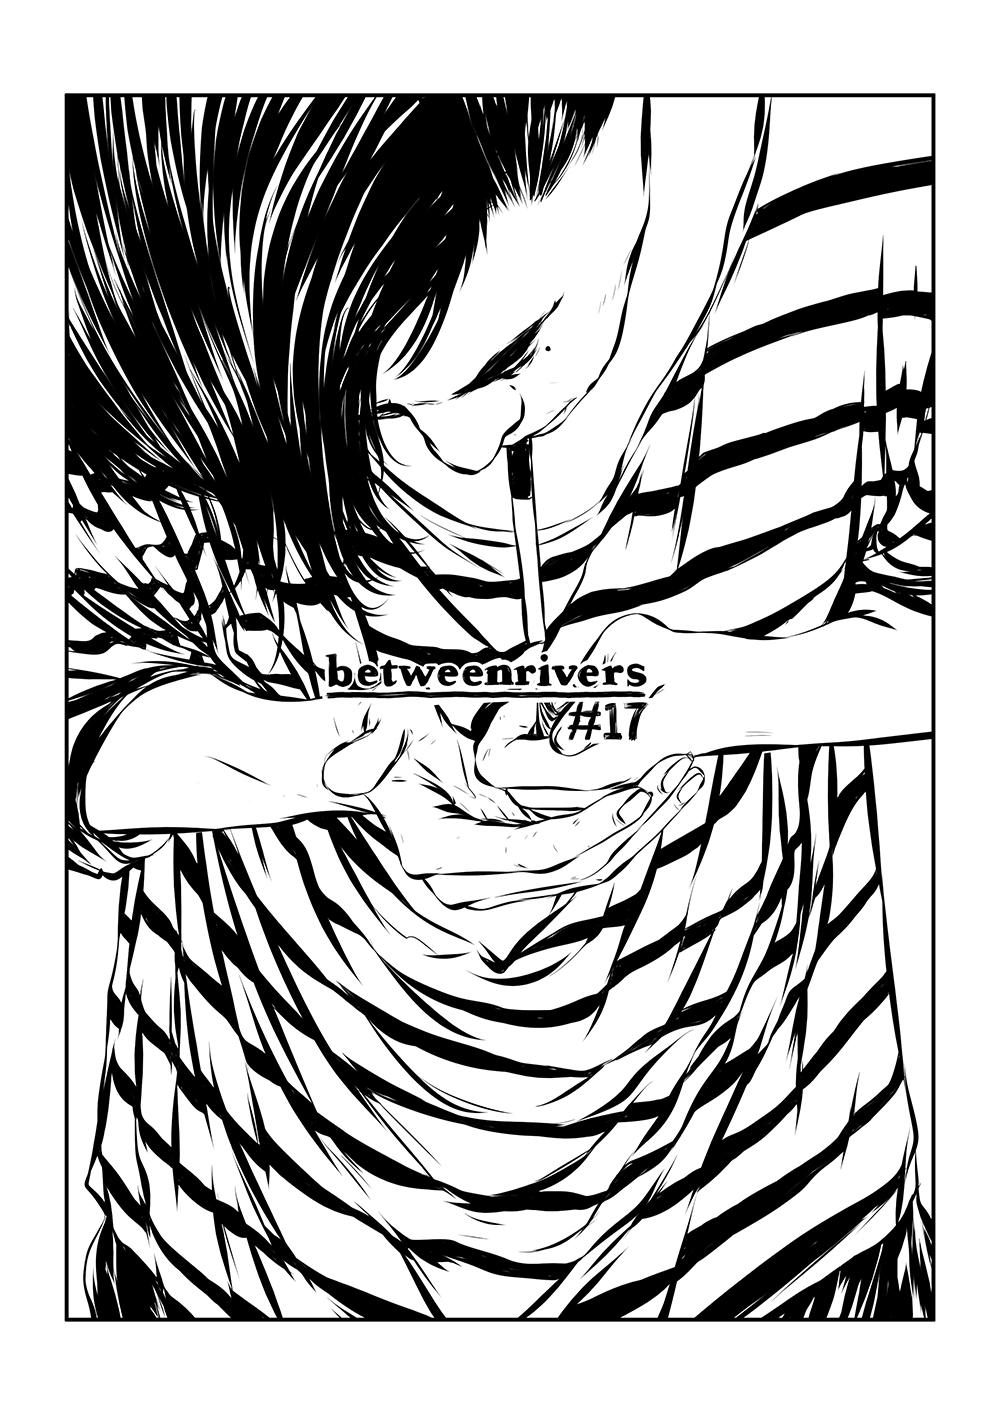 mojowang_illustration_betweenrivers_17_0.jpg